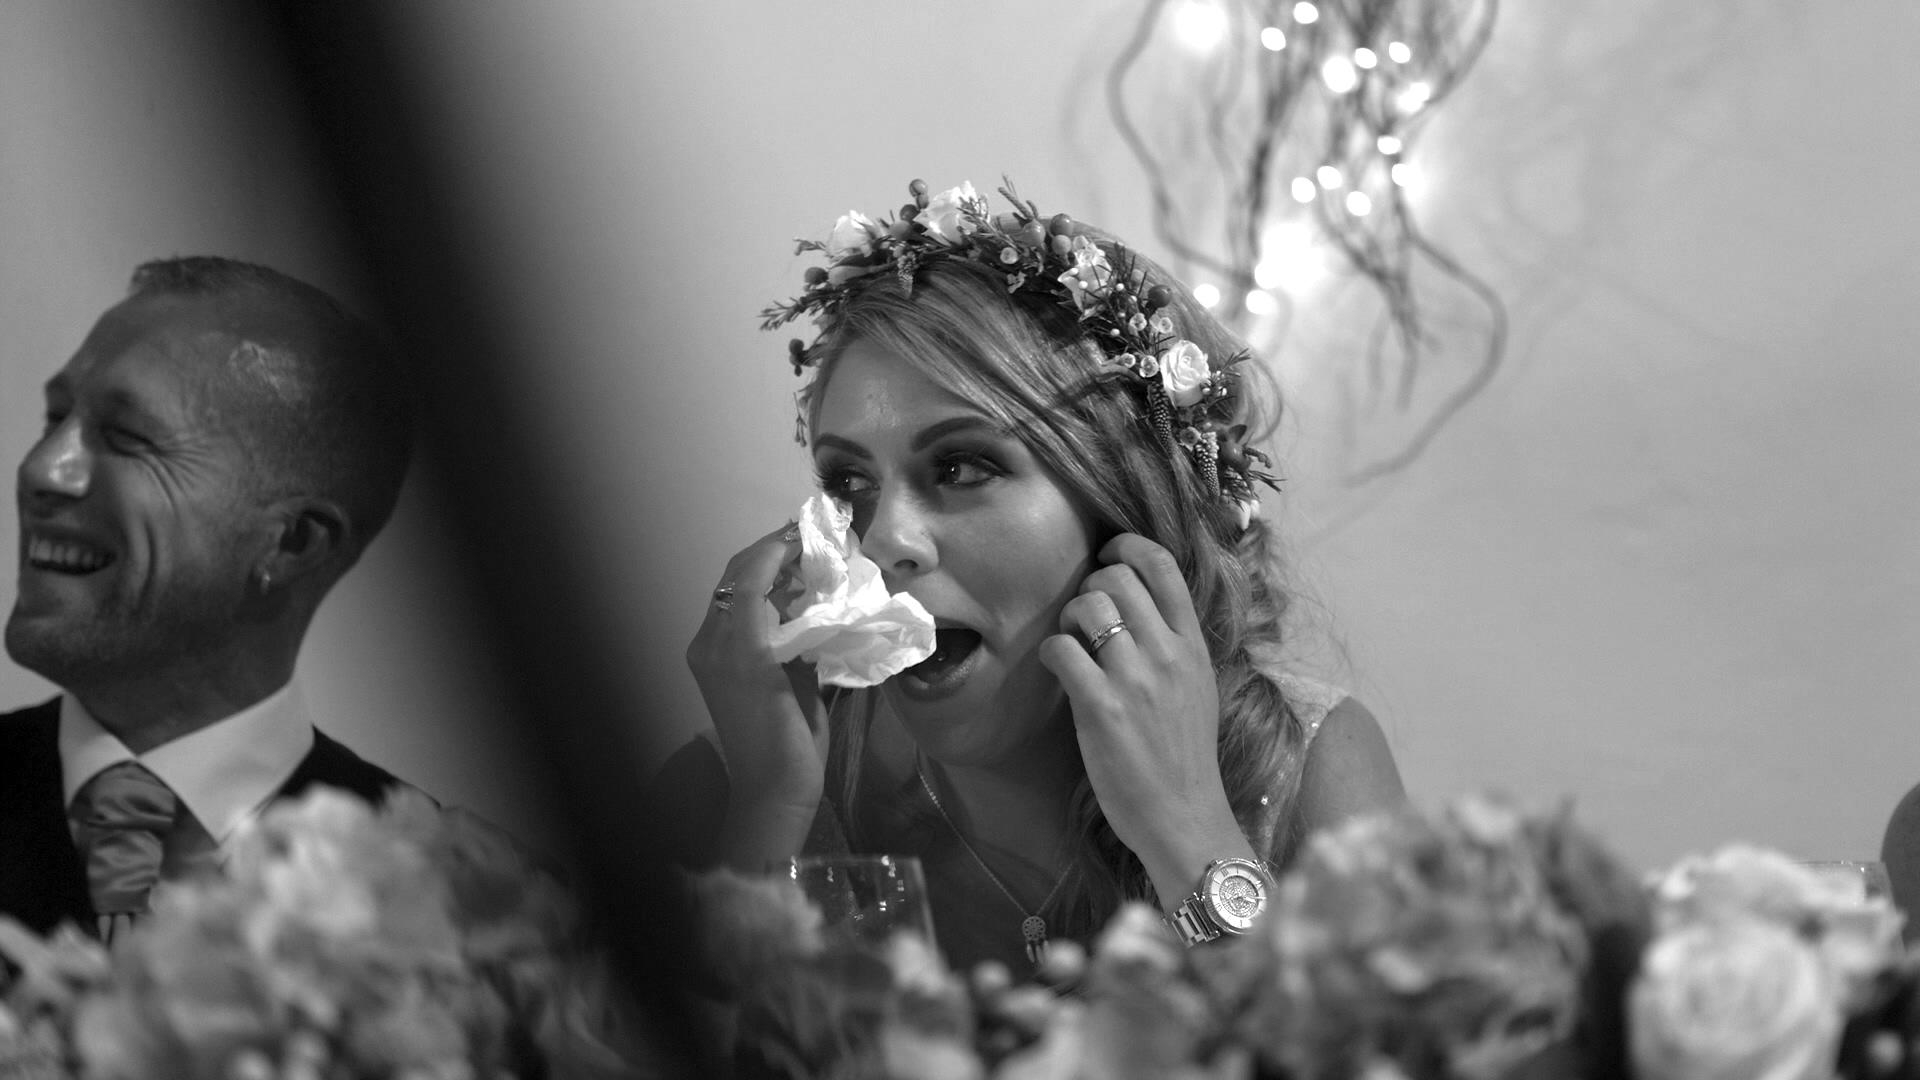 ASWANLEY-SUMMER-WEDDING (18).jpg